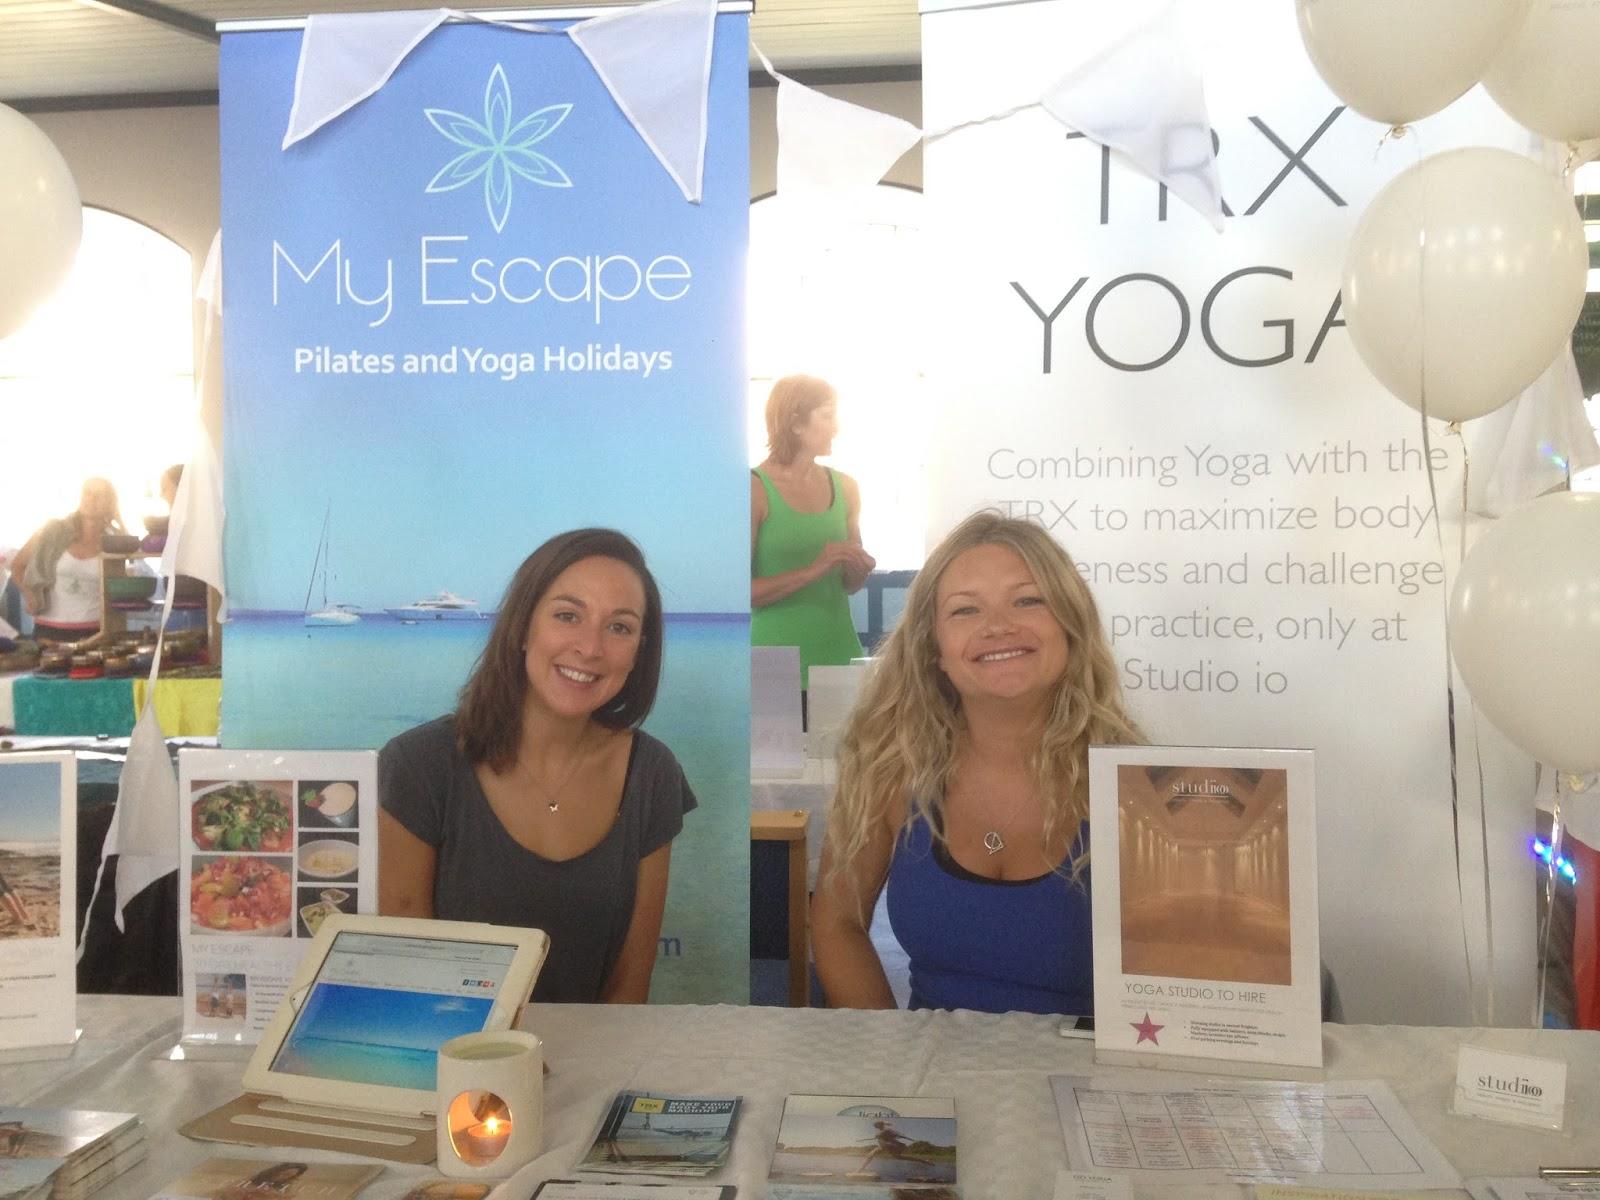 Brighton Yoga Festival - Ellie & Holly from MyEscape / Studio iO